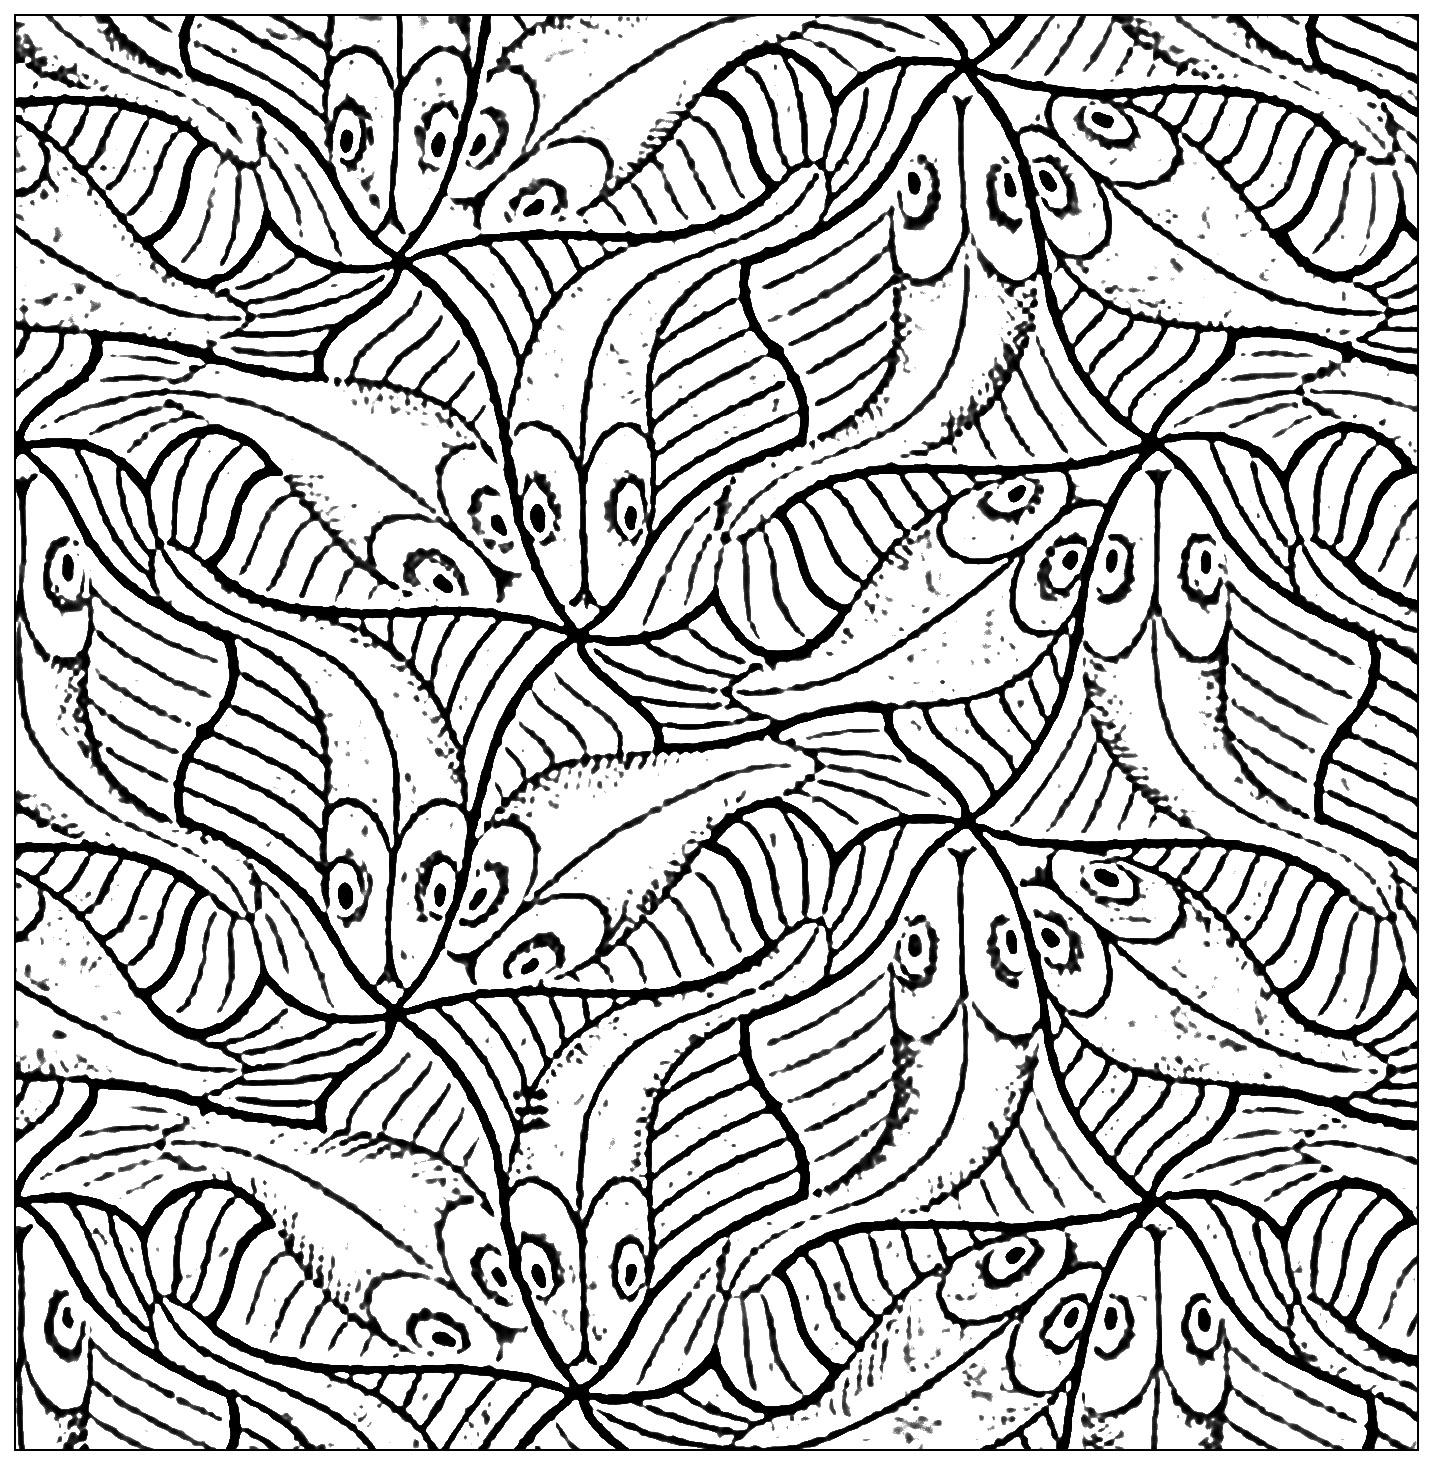 Colorear para adultos  : Peces - 18